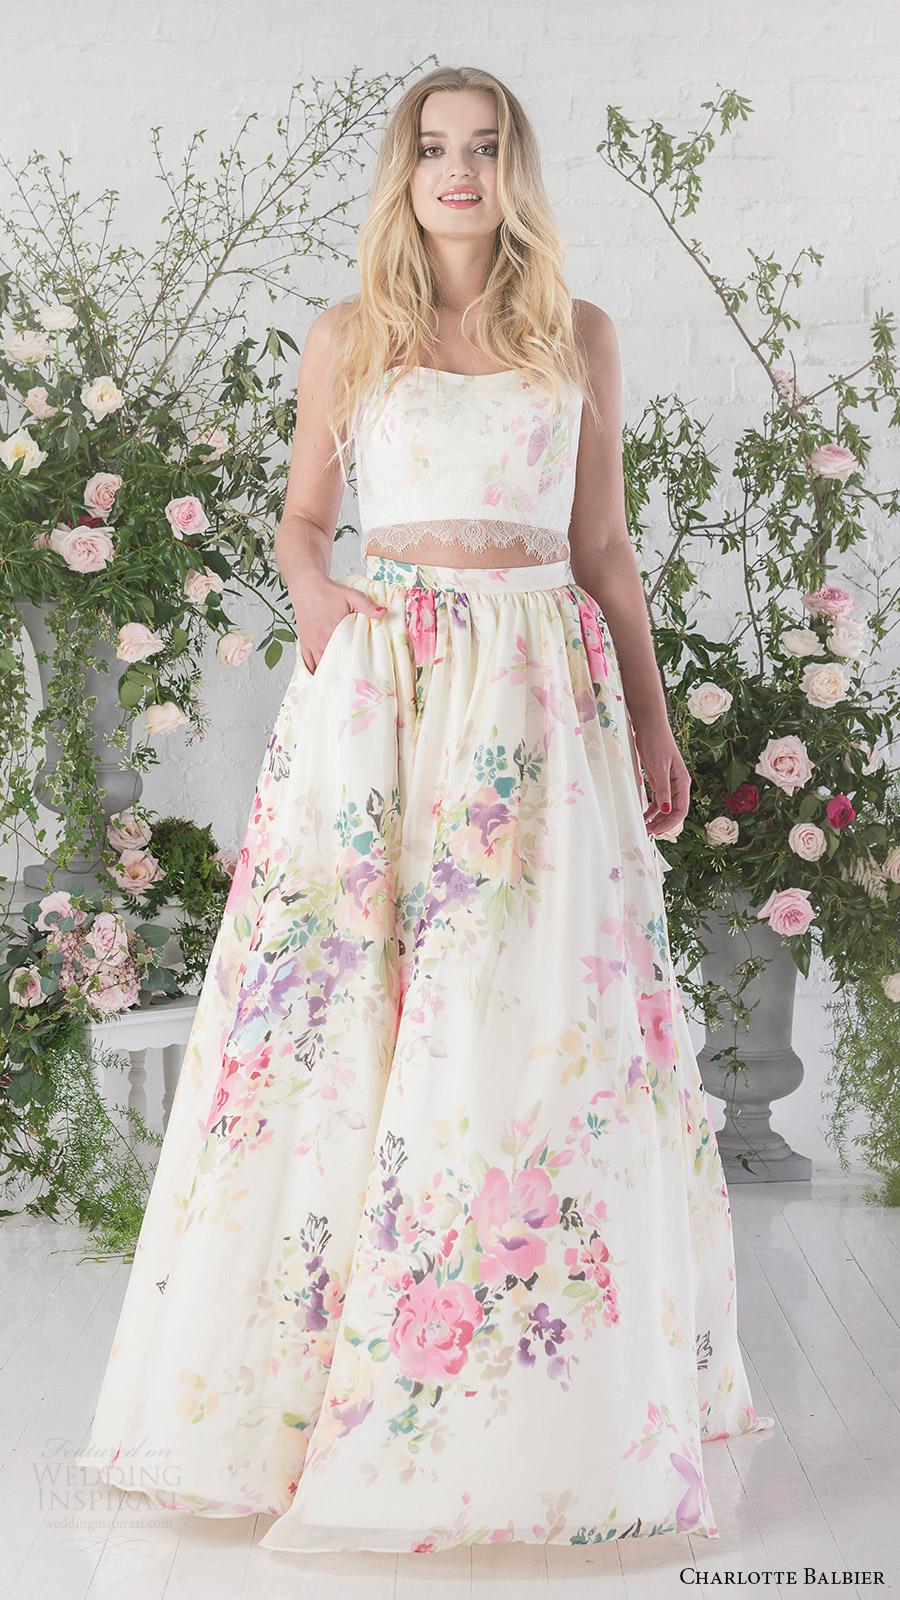 Floral Print Wedding Dresses 10 Cool charlotte balbier bridal strapless